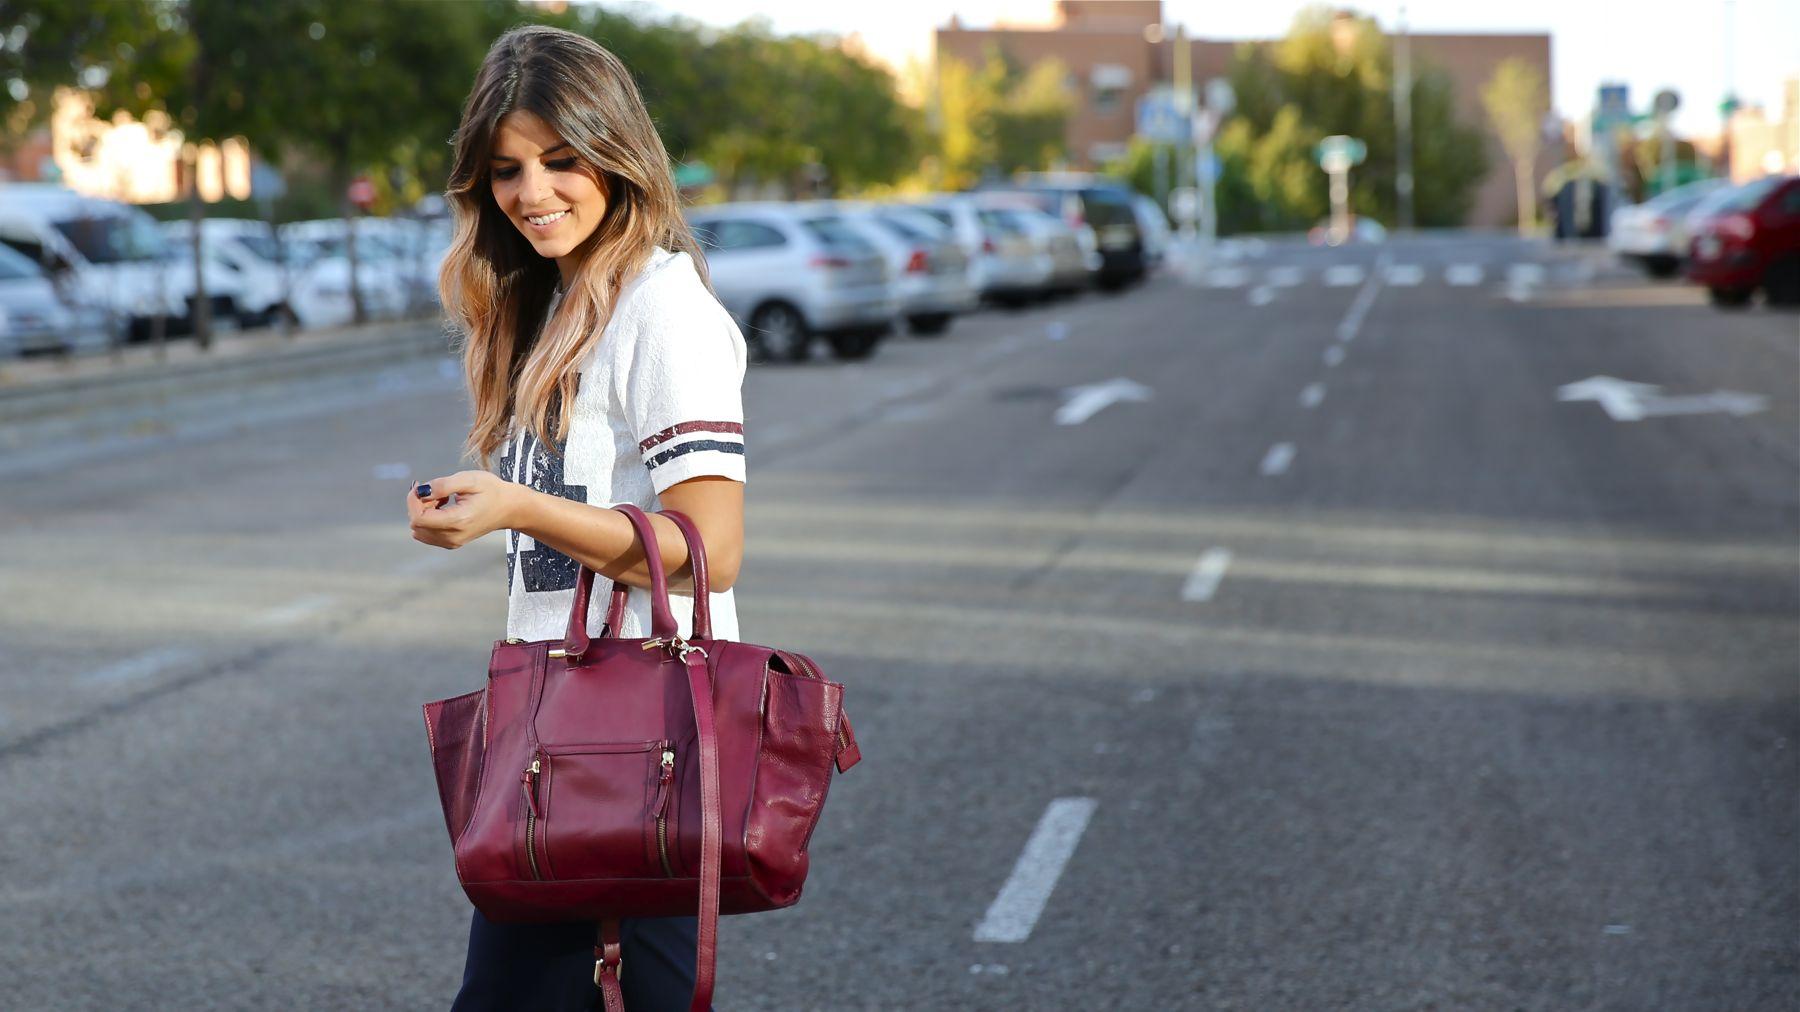 trendy_taste-look-outfit-street_style-ootd-blog-blogger-fashion_spain-moda_españa-zara-stan_smith-adidas-cosette-tee-baseball-camiseta-numero-pantalón-capri-pinzas-15